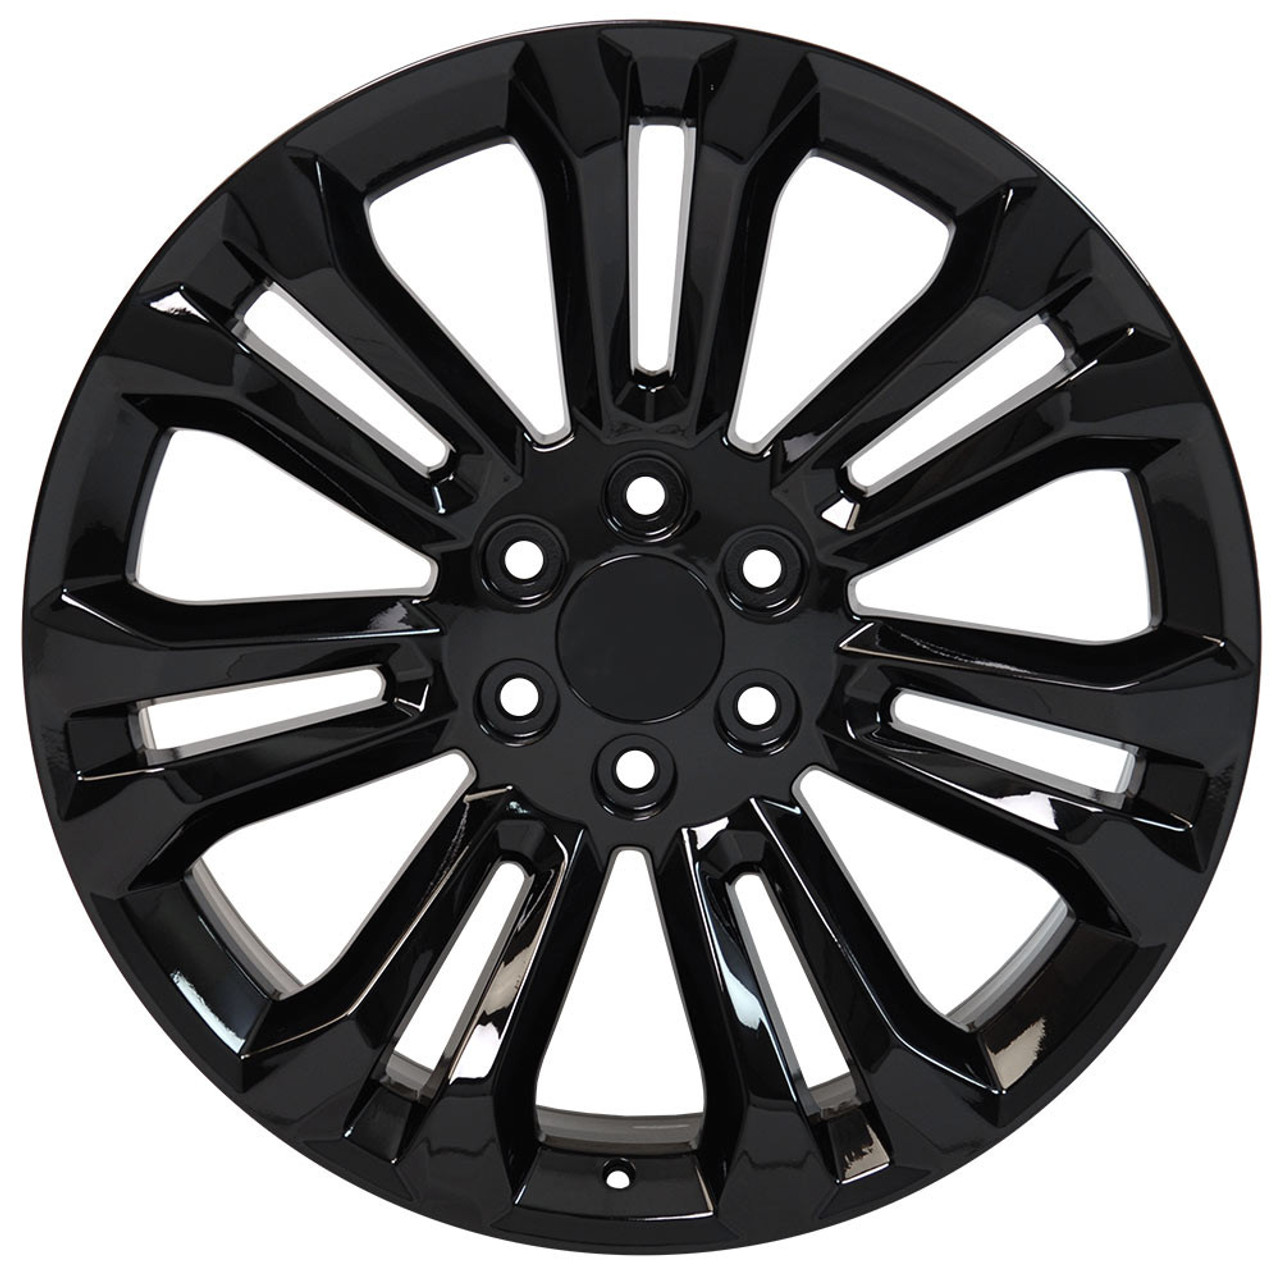 "Gloss Black 22"" Seven Split Spoke Wheels with 285/45R22 Tires for Chevy Silverado, Tahoe, Suburban - New Set of 4"